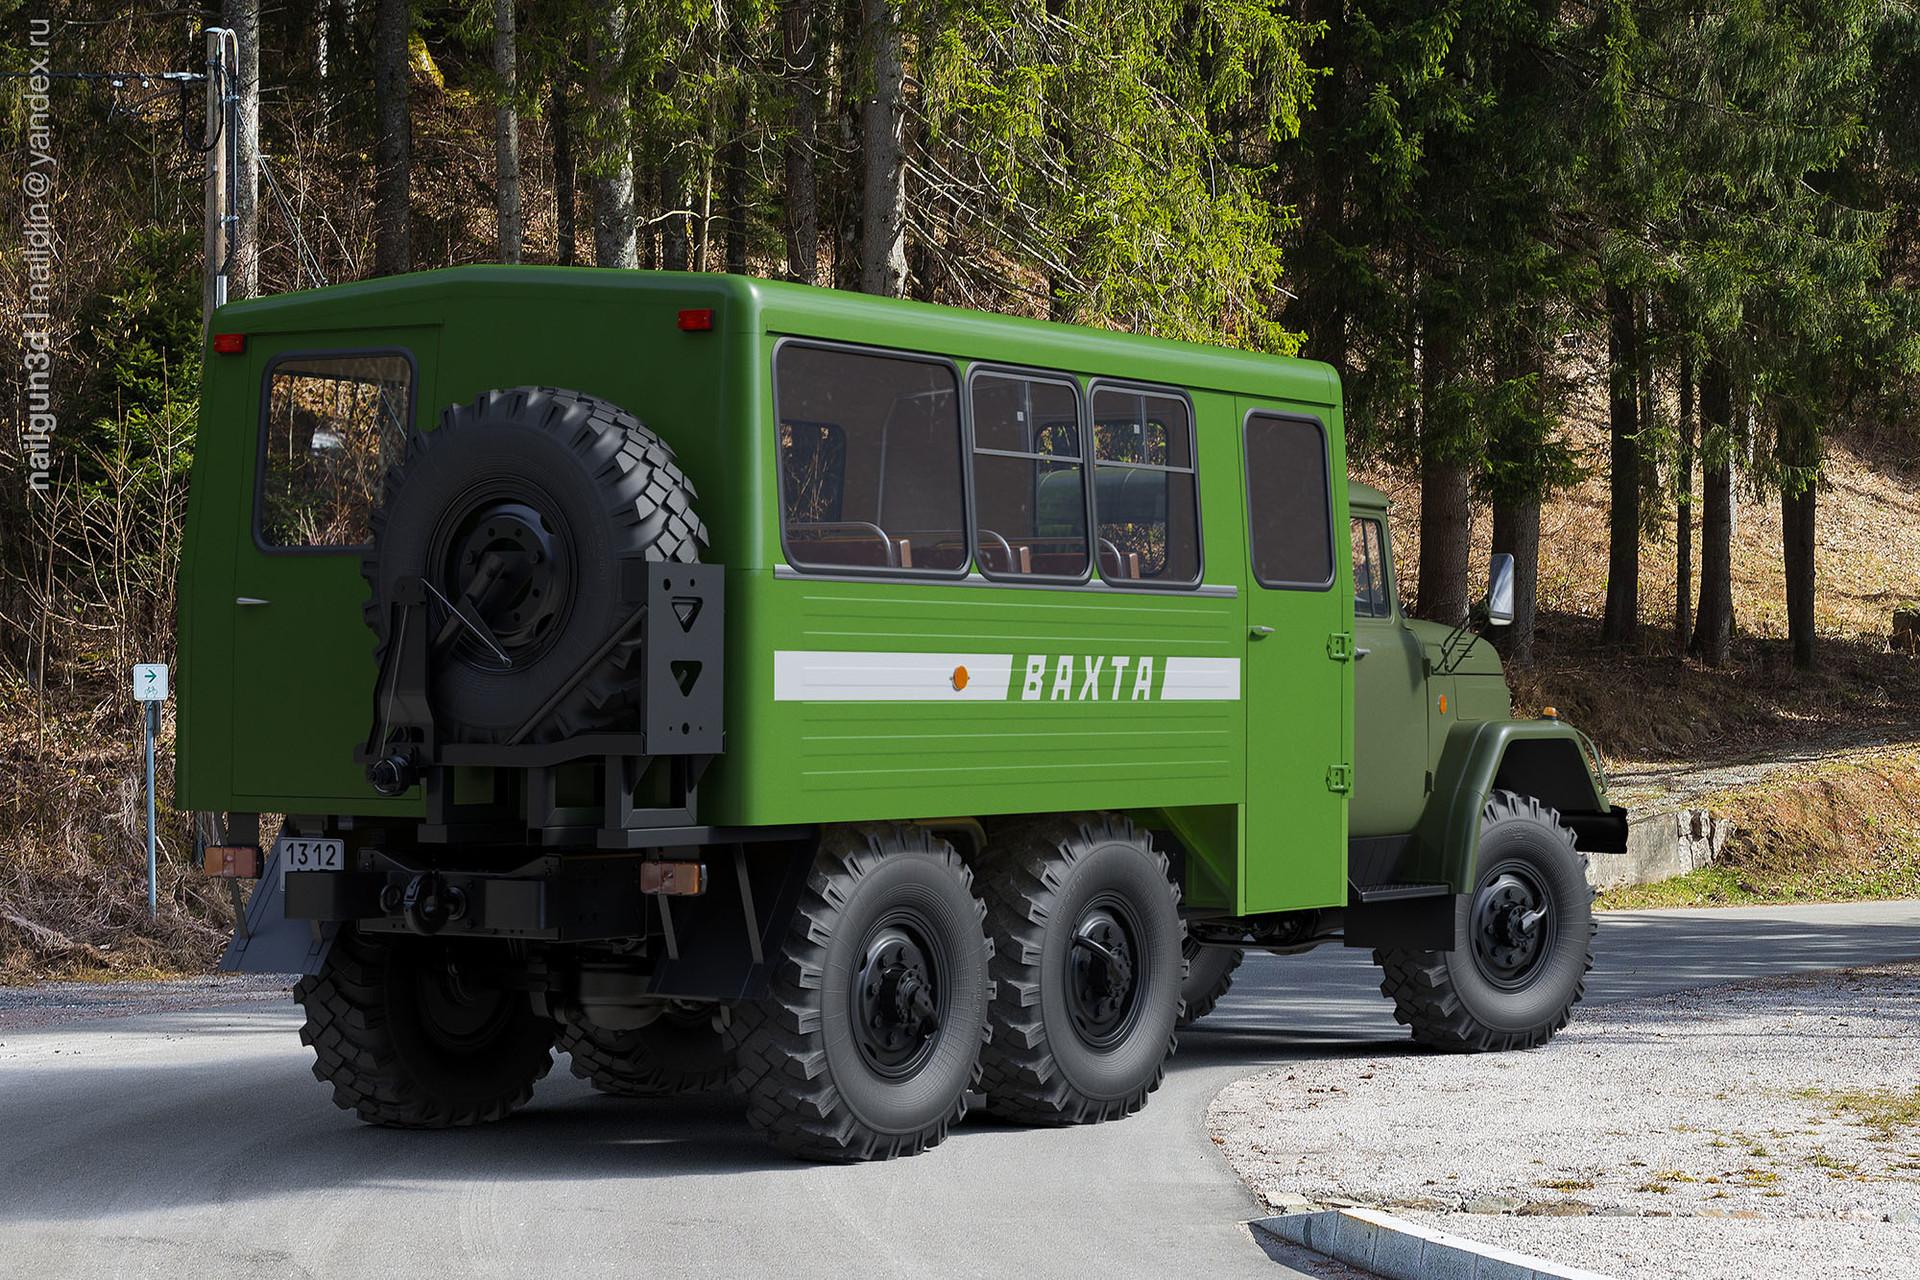 Nail khusnutdinov alg 027 011 zil 131 vachta rear view 3x